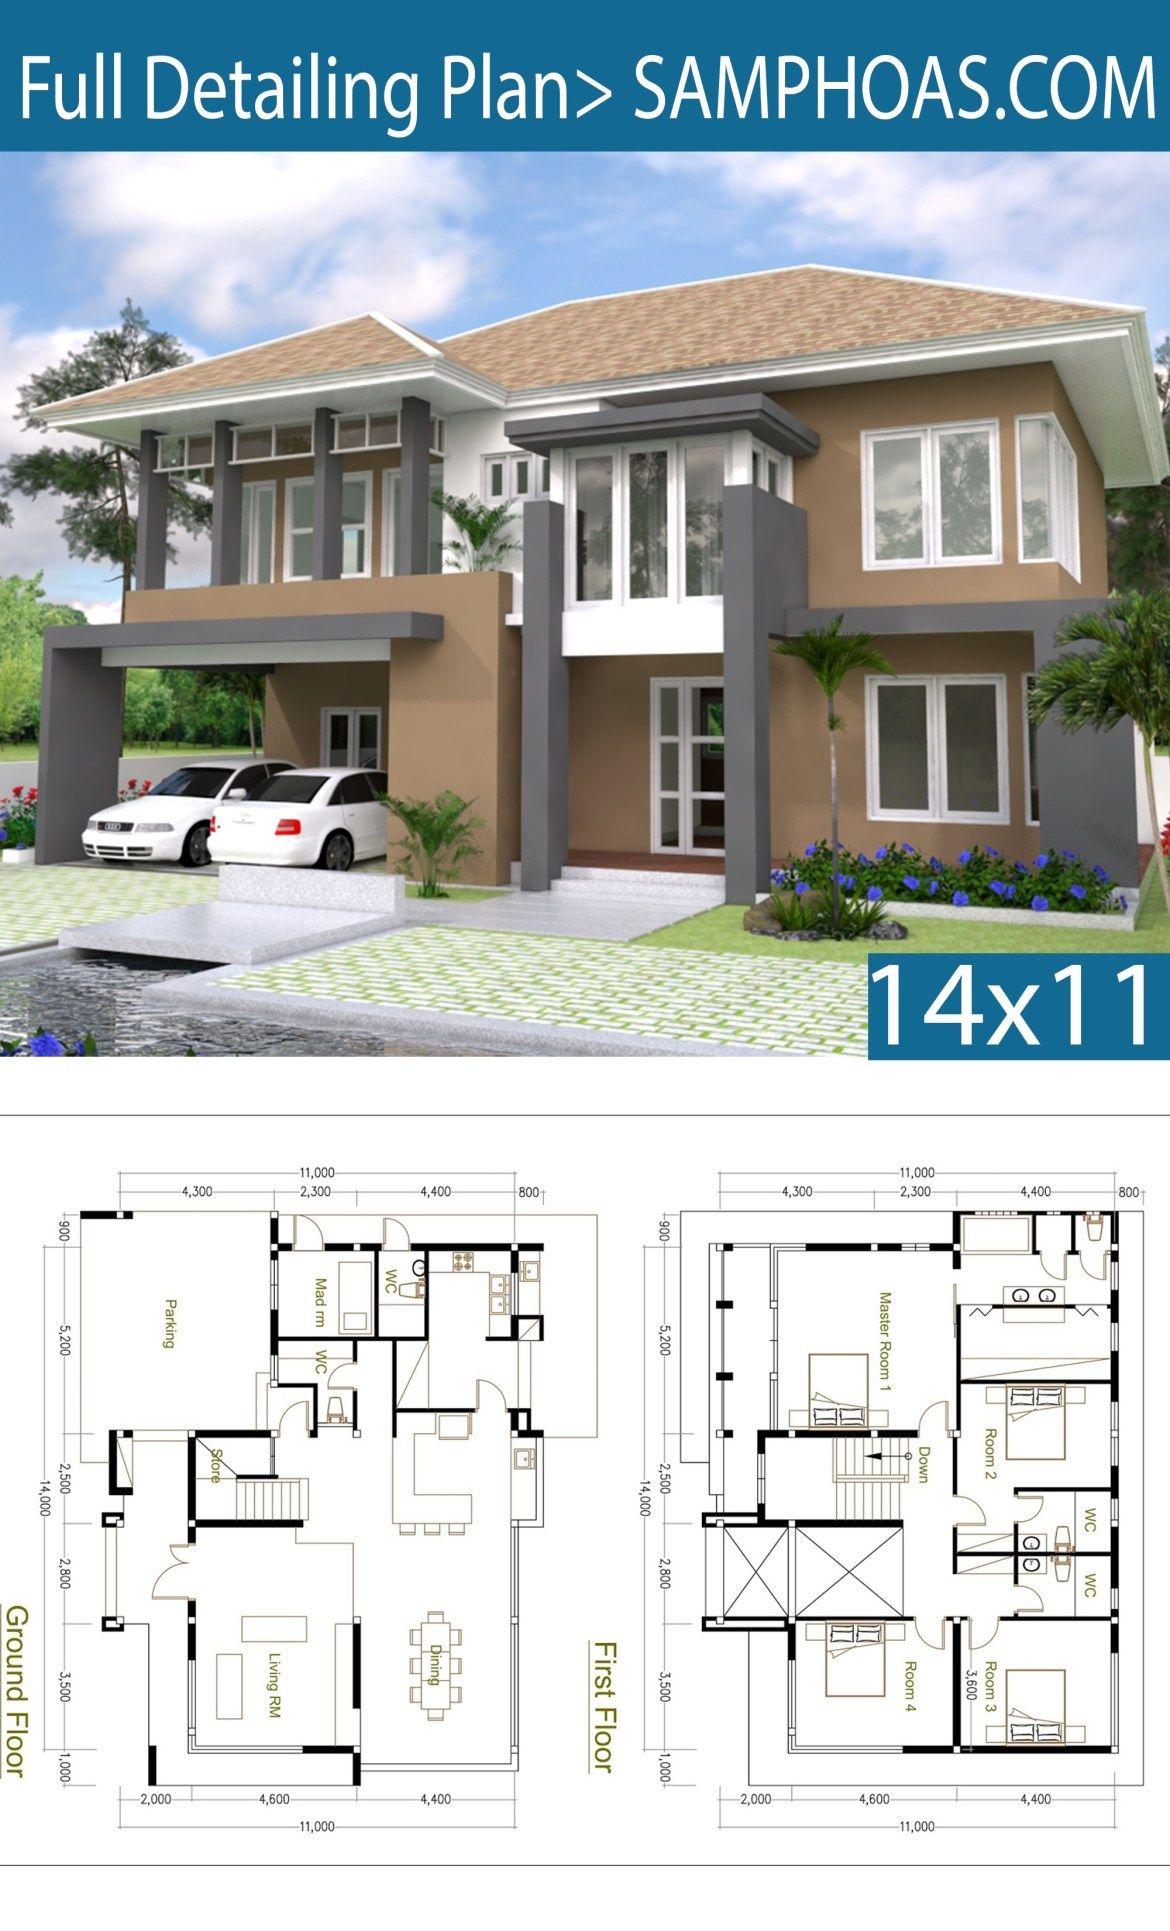 4 Bedrooms Home Design Plan Size 14x11m Samphoas Plansearch Duplex House Design Free House Design Modern House Design